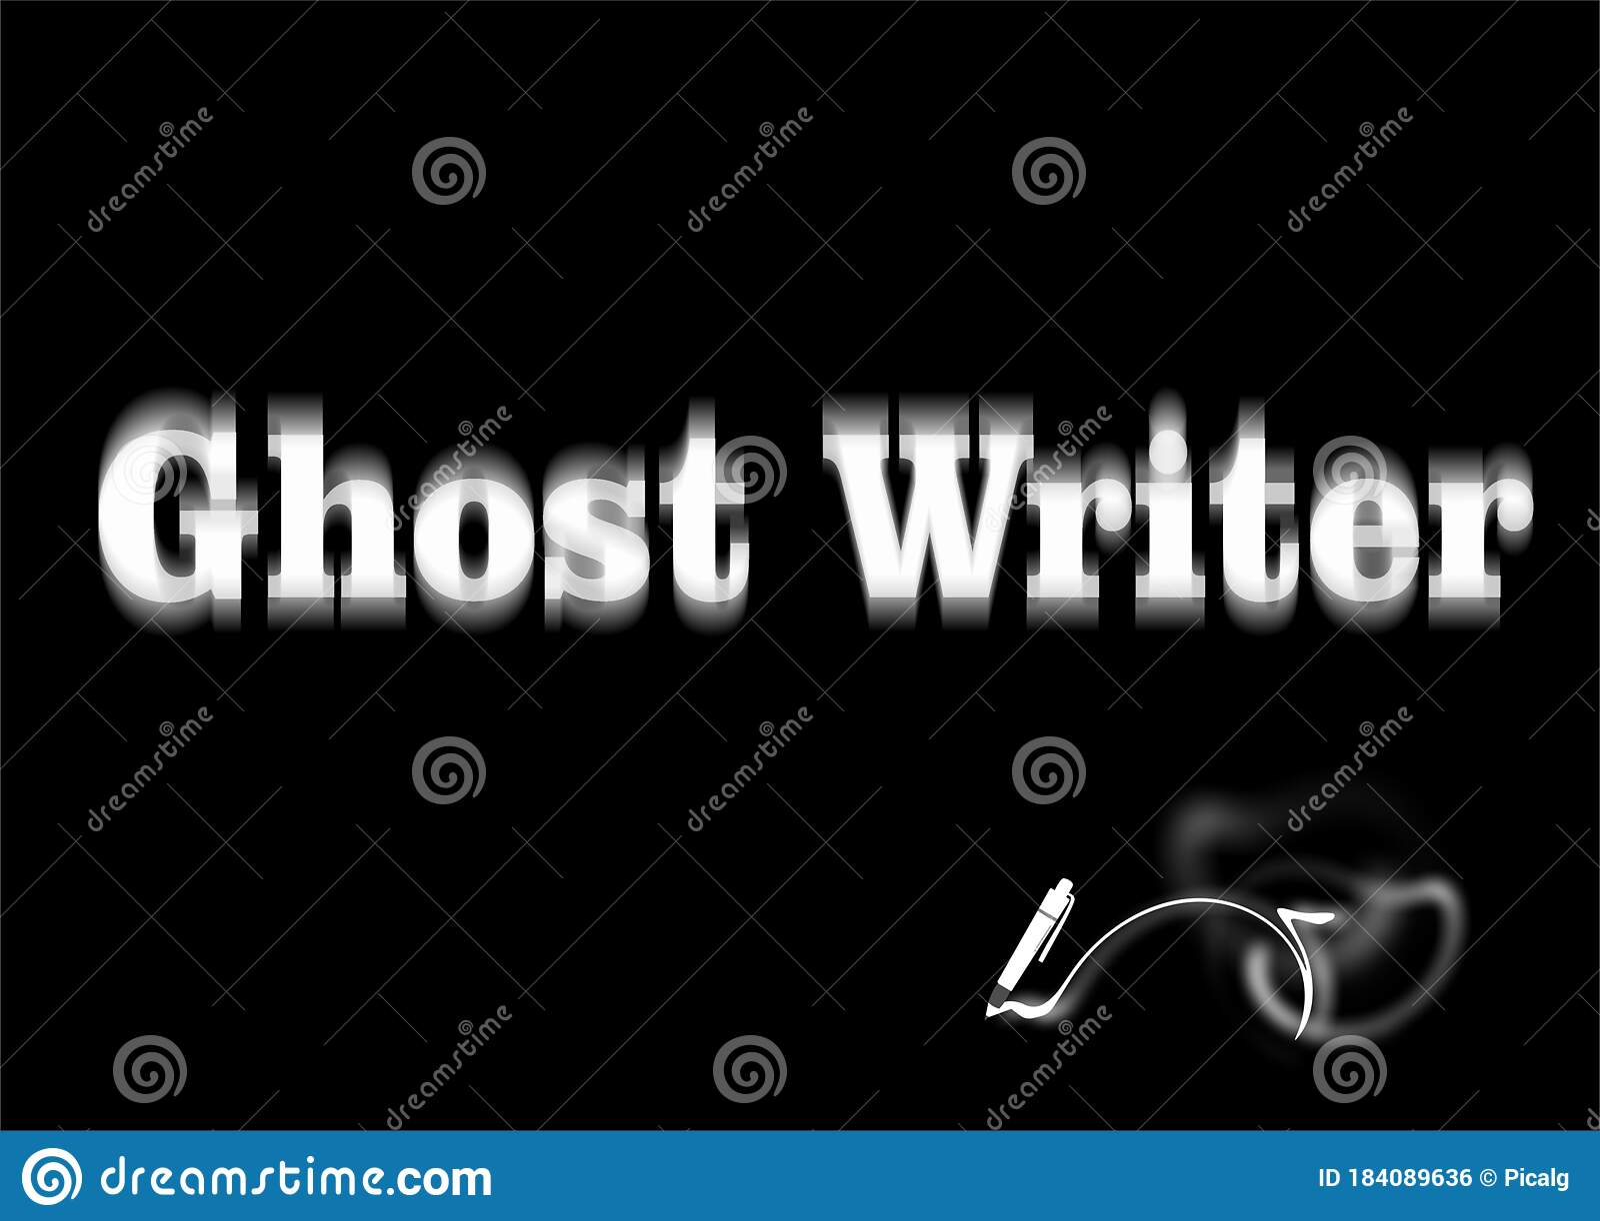 Presentation ghostwriter project planning training